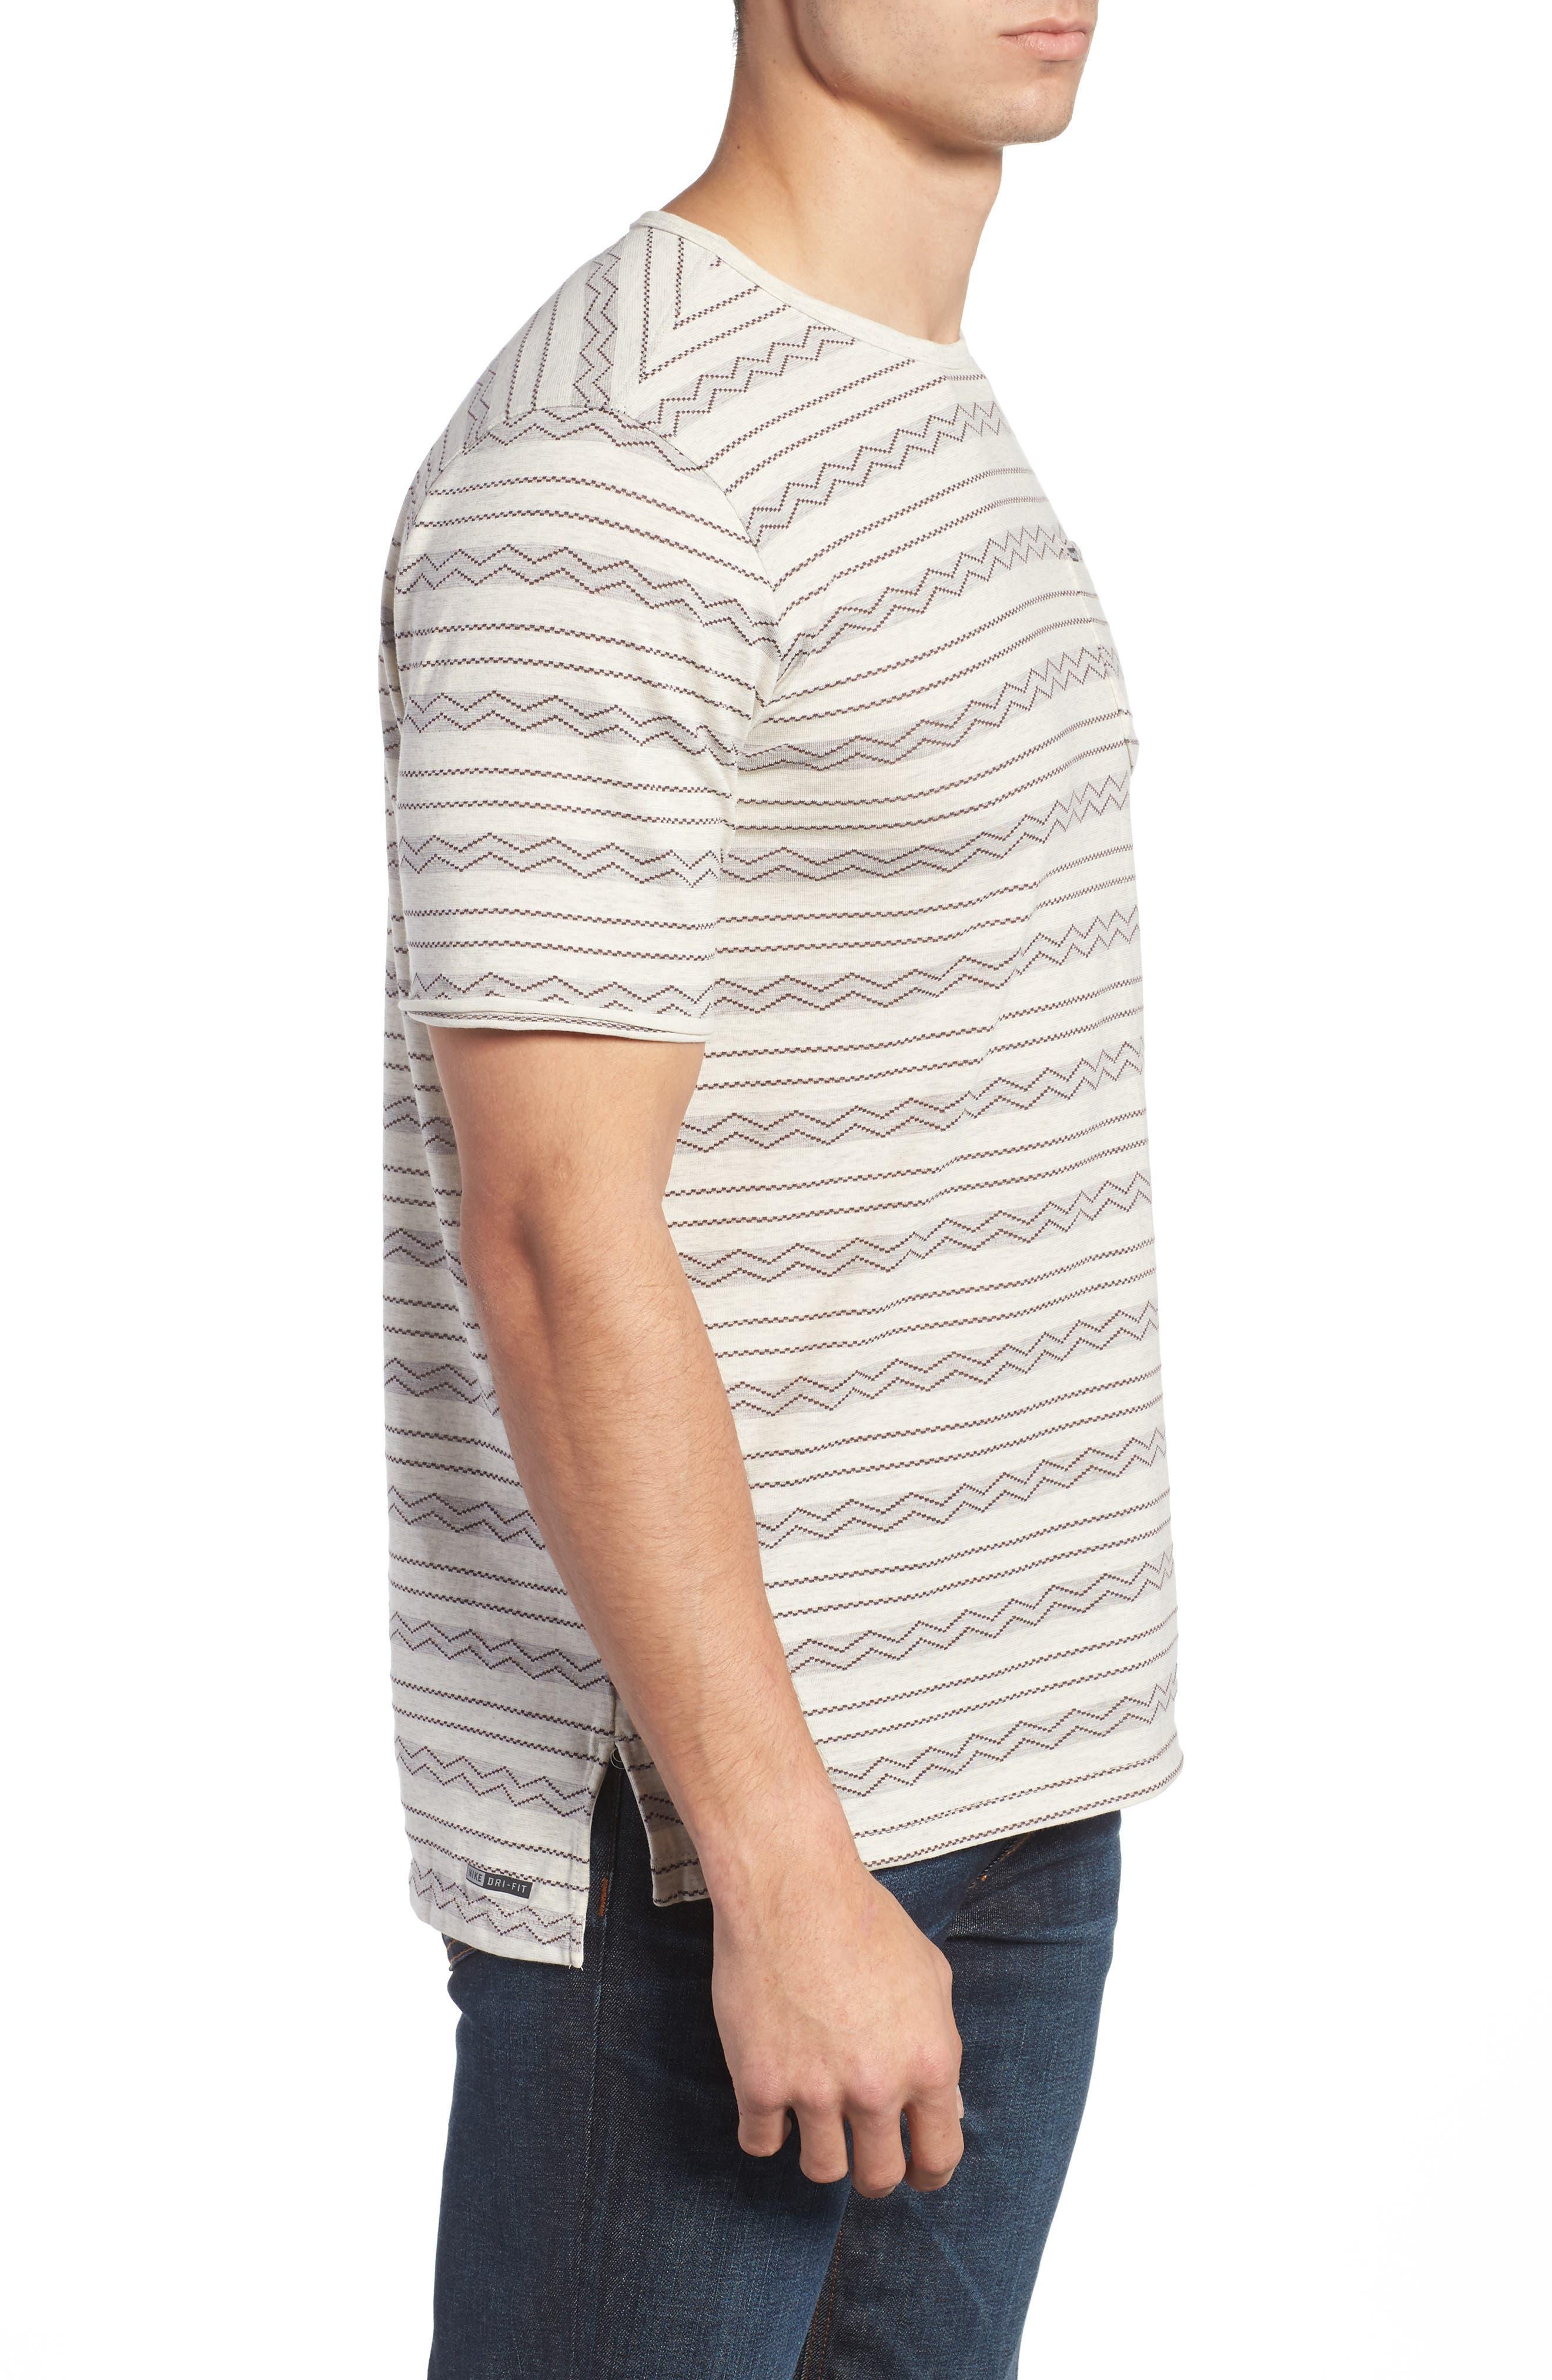 Alternate Image 3  - Hurley Pismo Dri-FIT T-Shirt